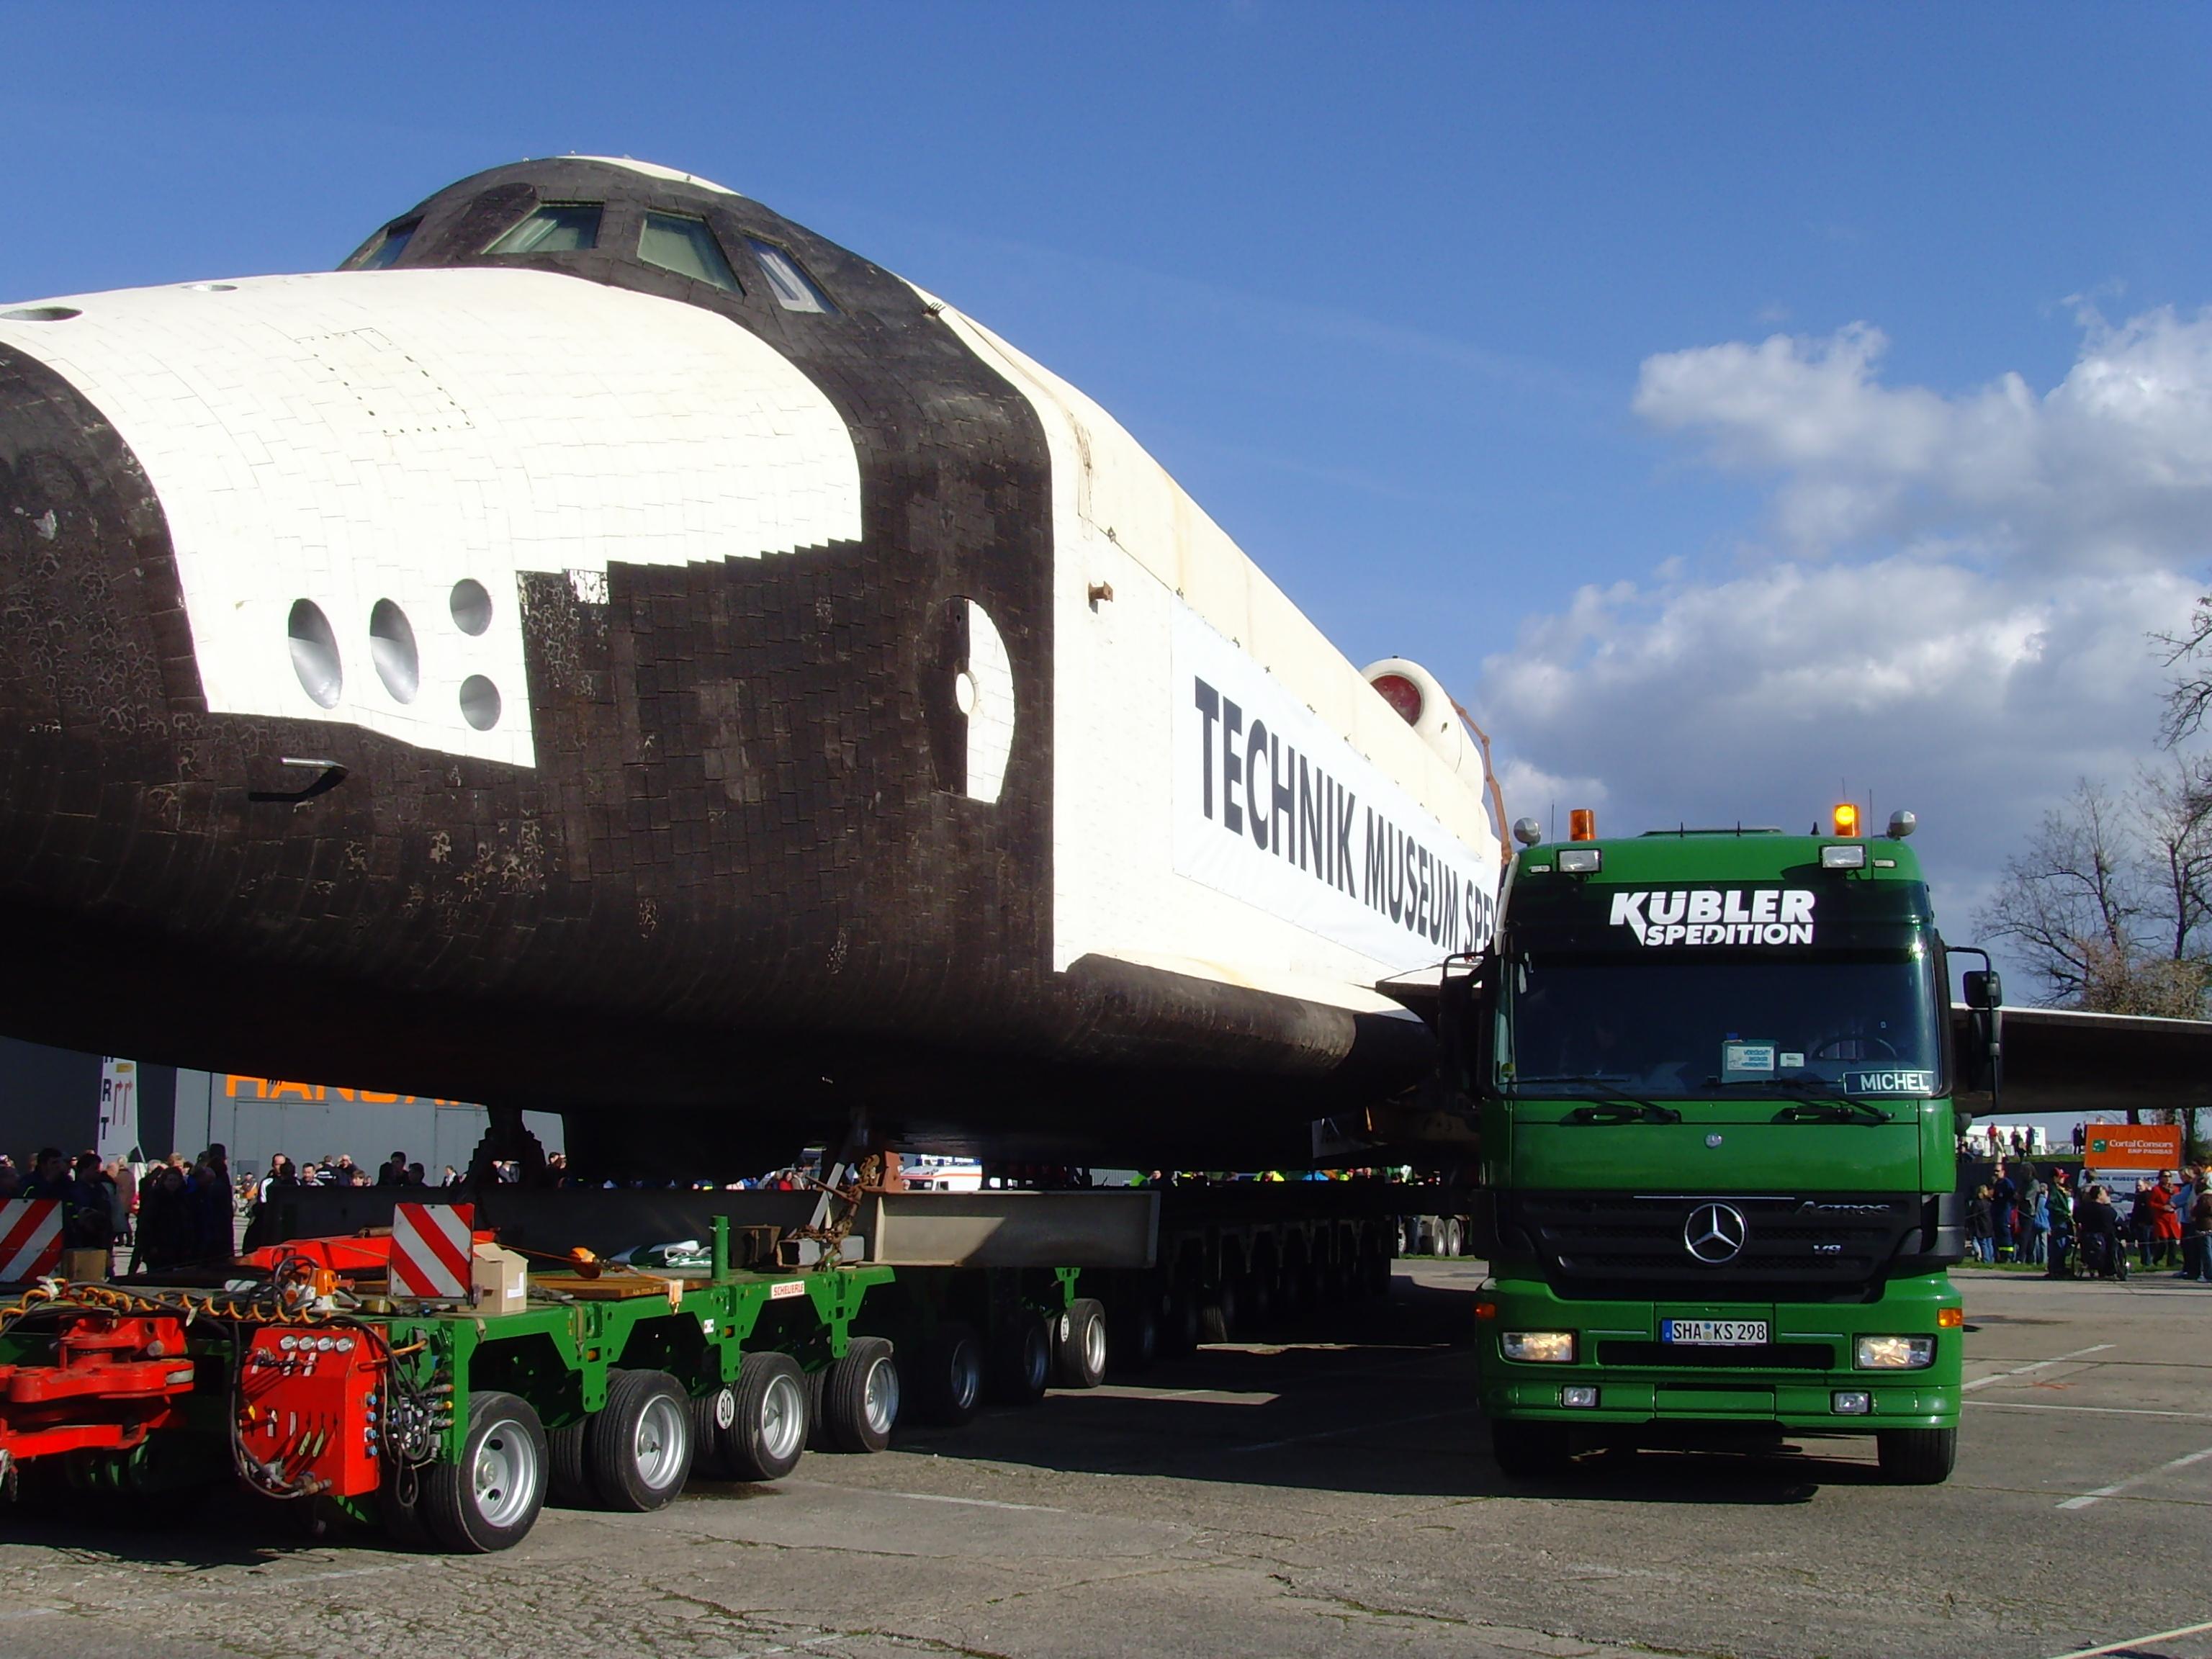 File:Space Shuttle Buran Speyer.jpg - Wikimedia Commons